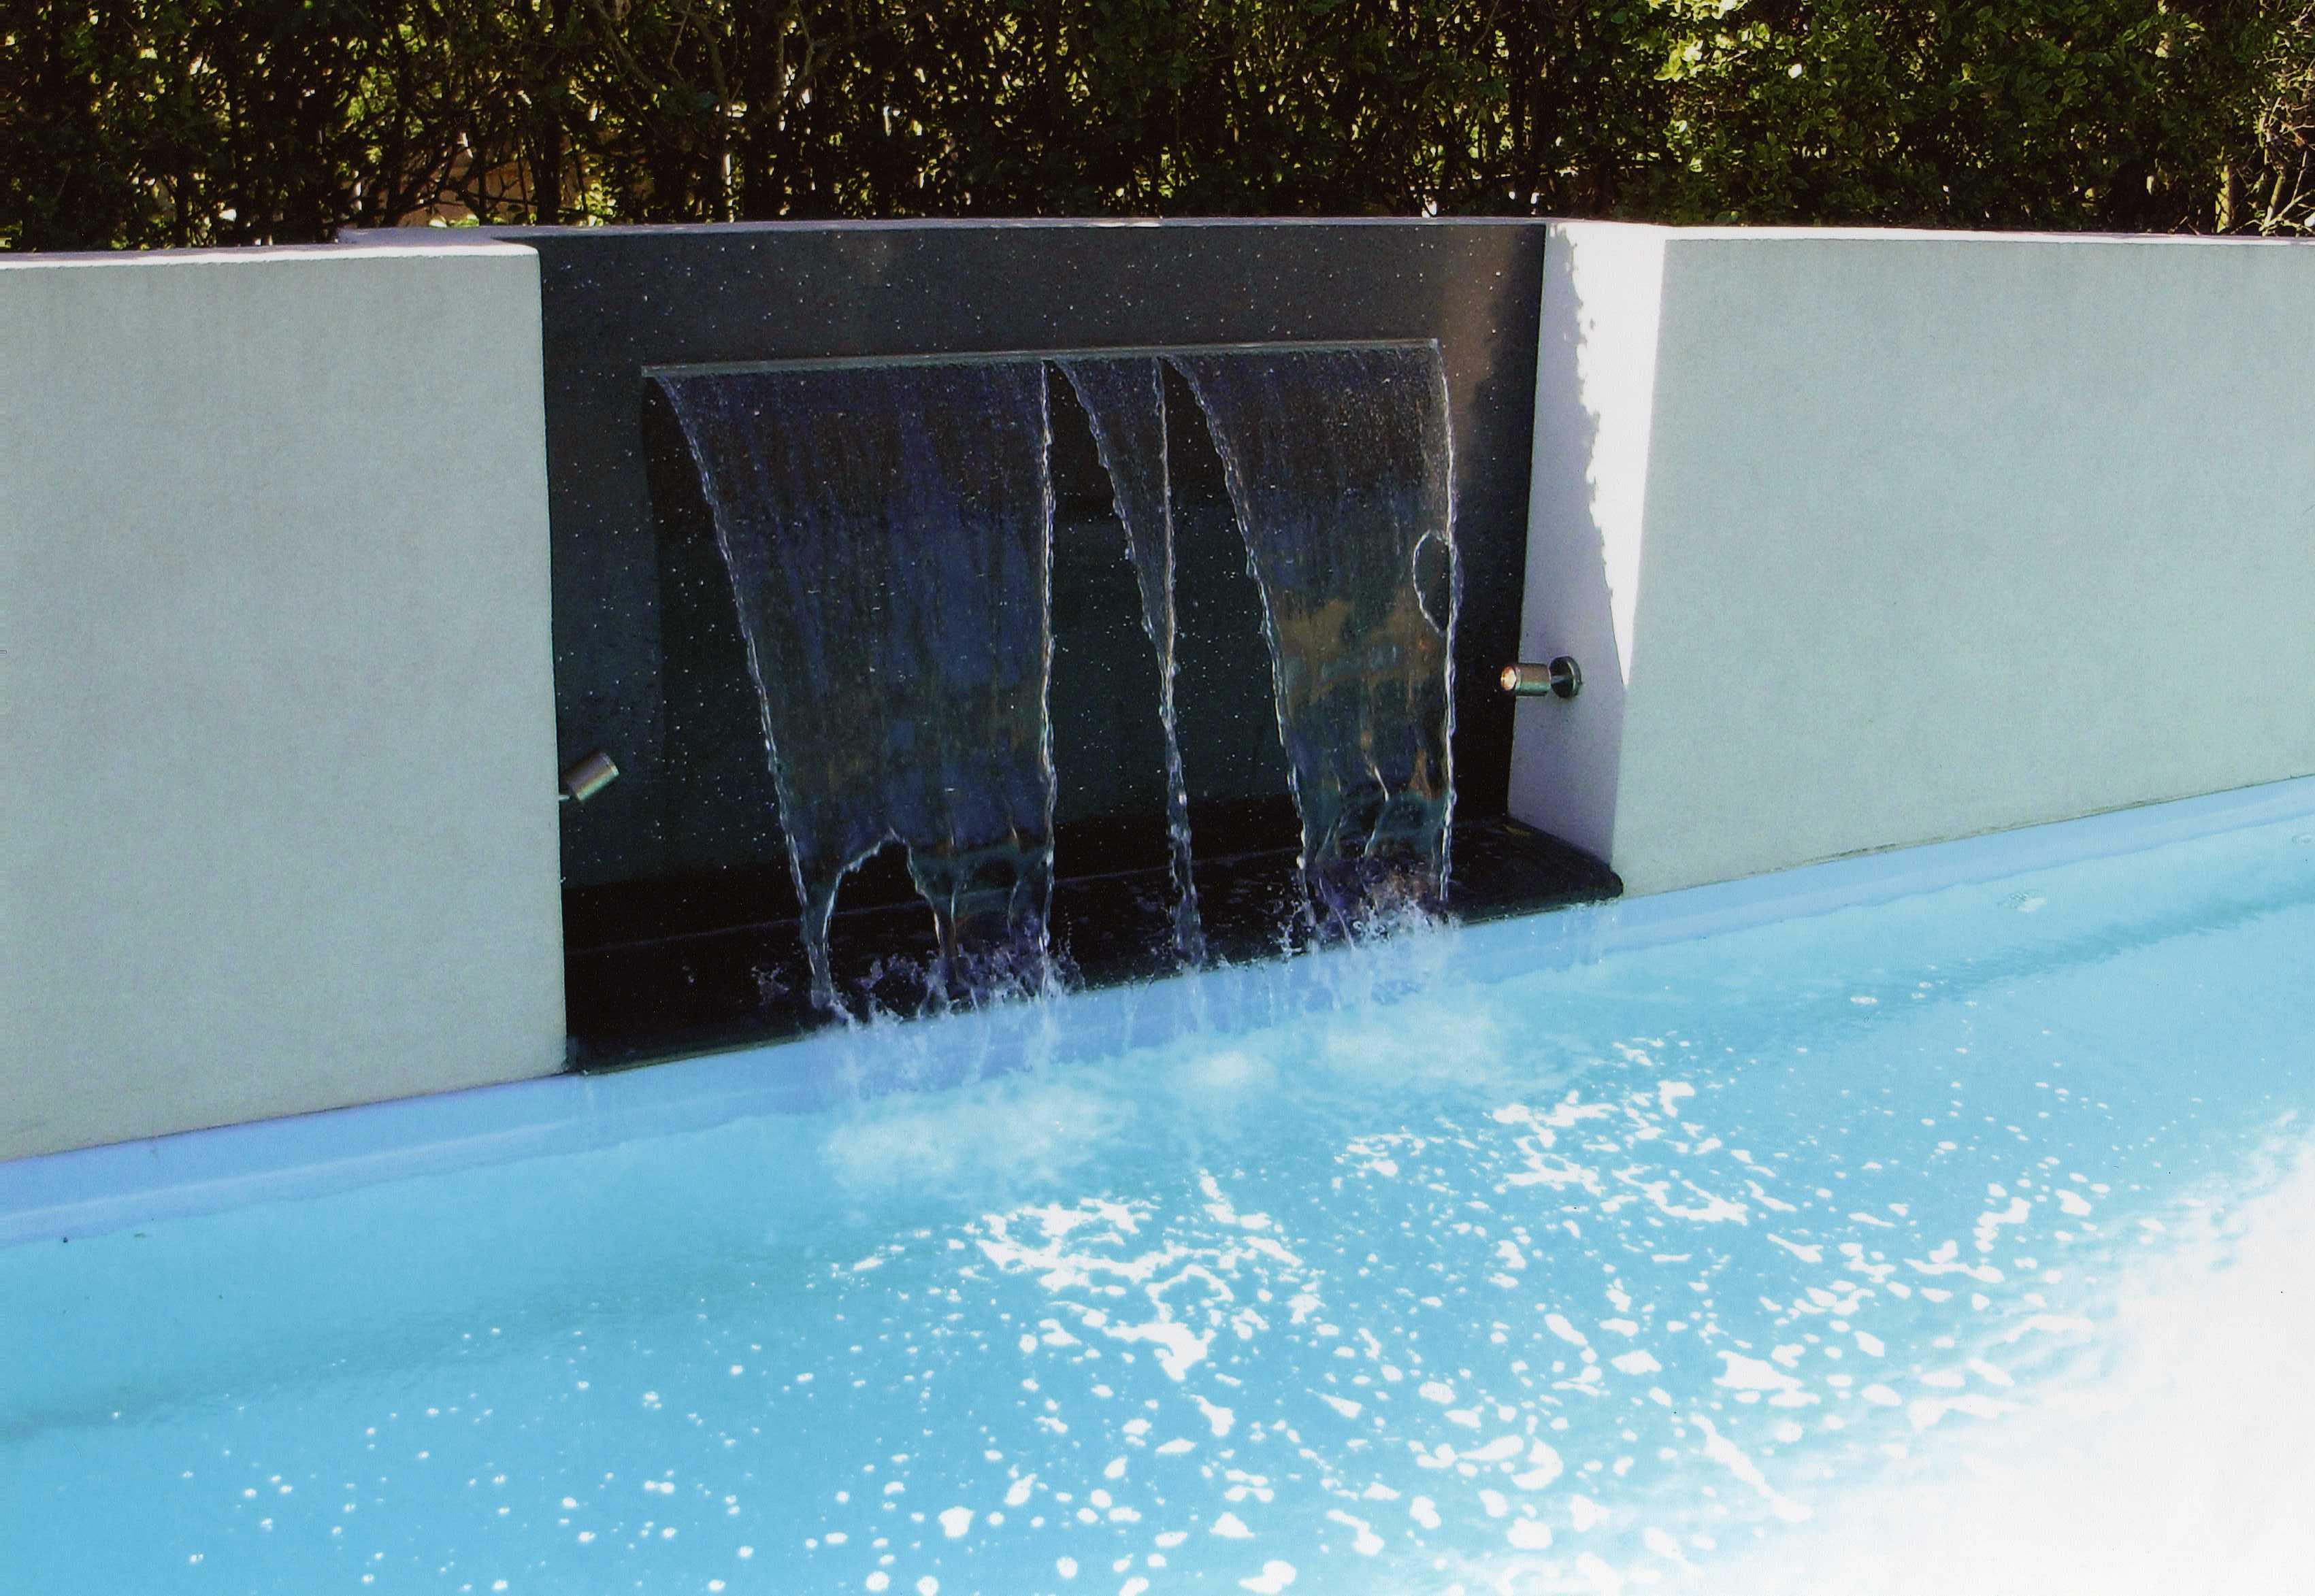 Black quartz wall installed next to the pool